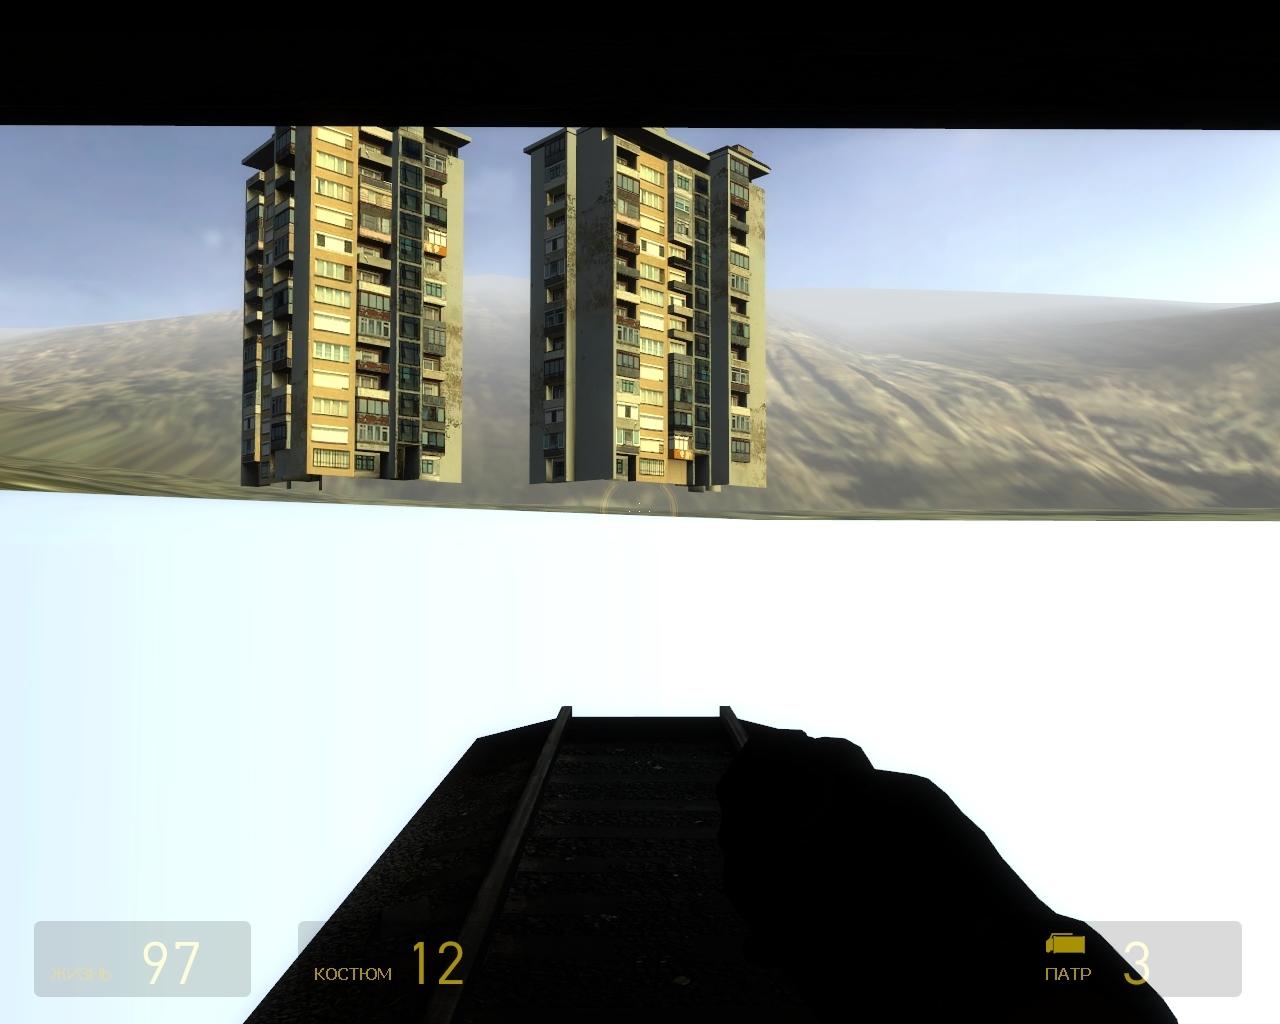 d1_town_050007.jpg - Half-Life 2 Half-Life 2: Update